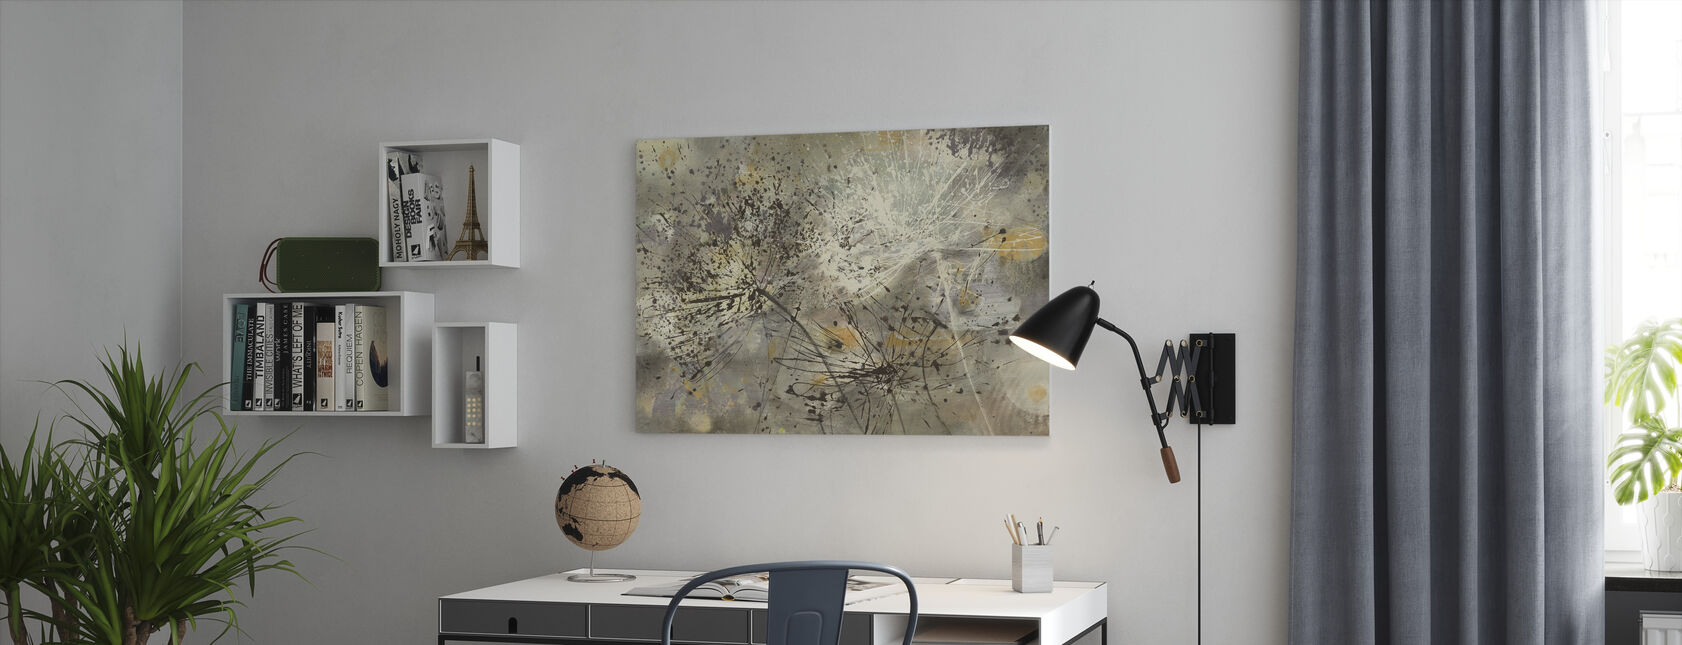 Sparklers 2 - Canvas print - Kantoor